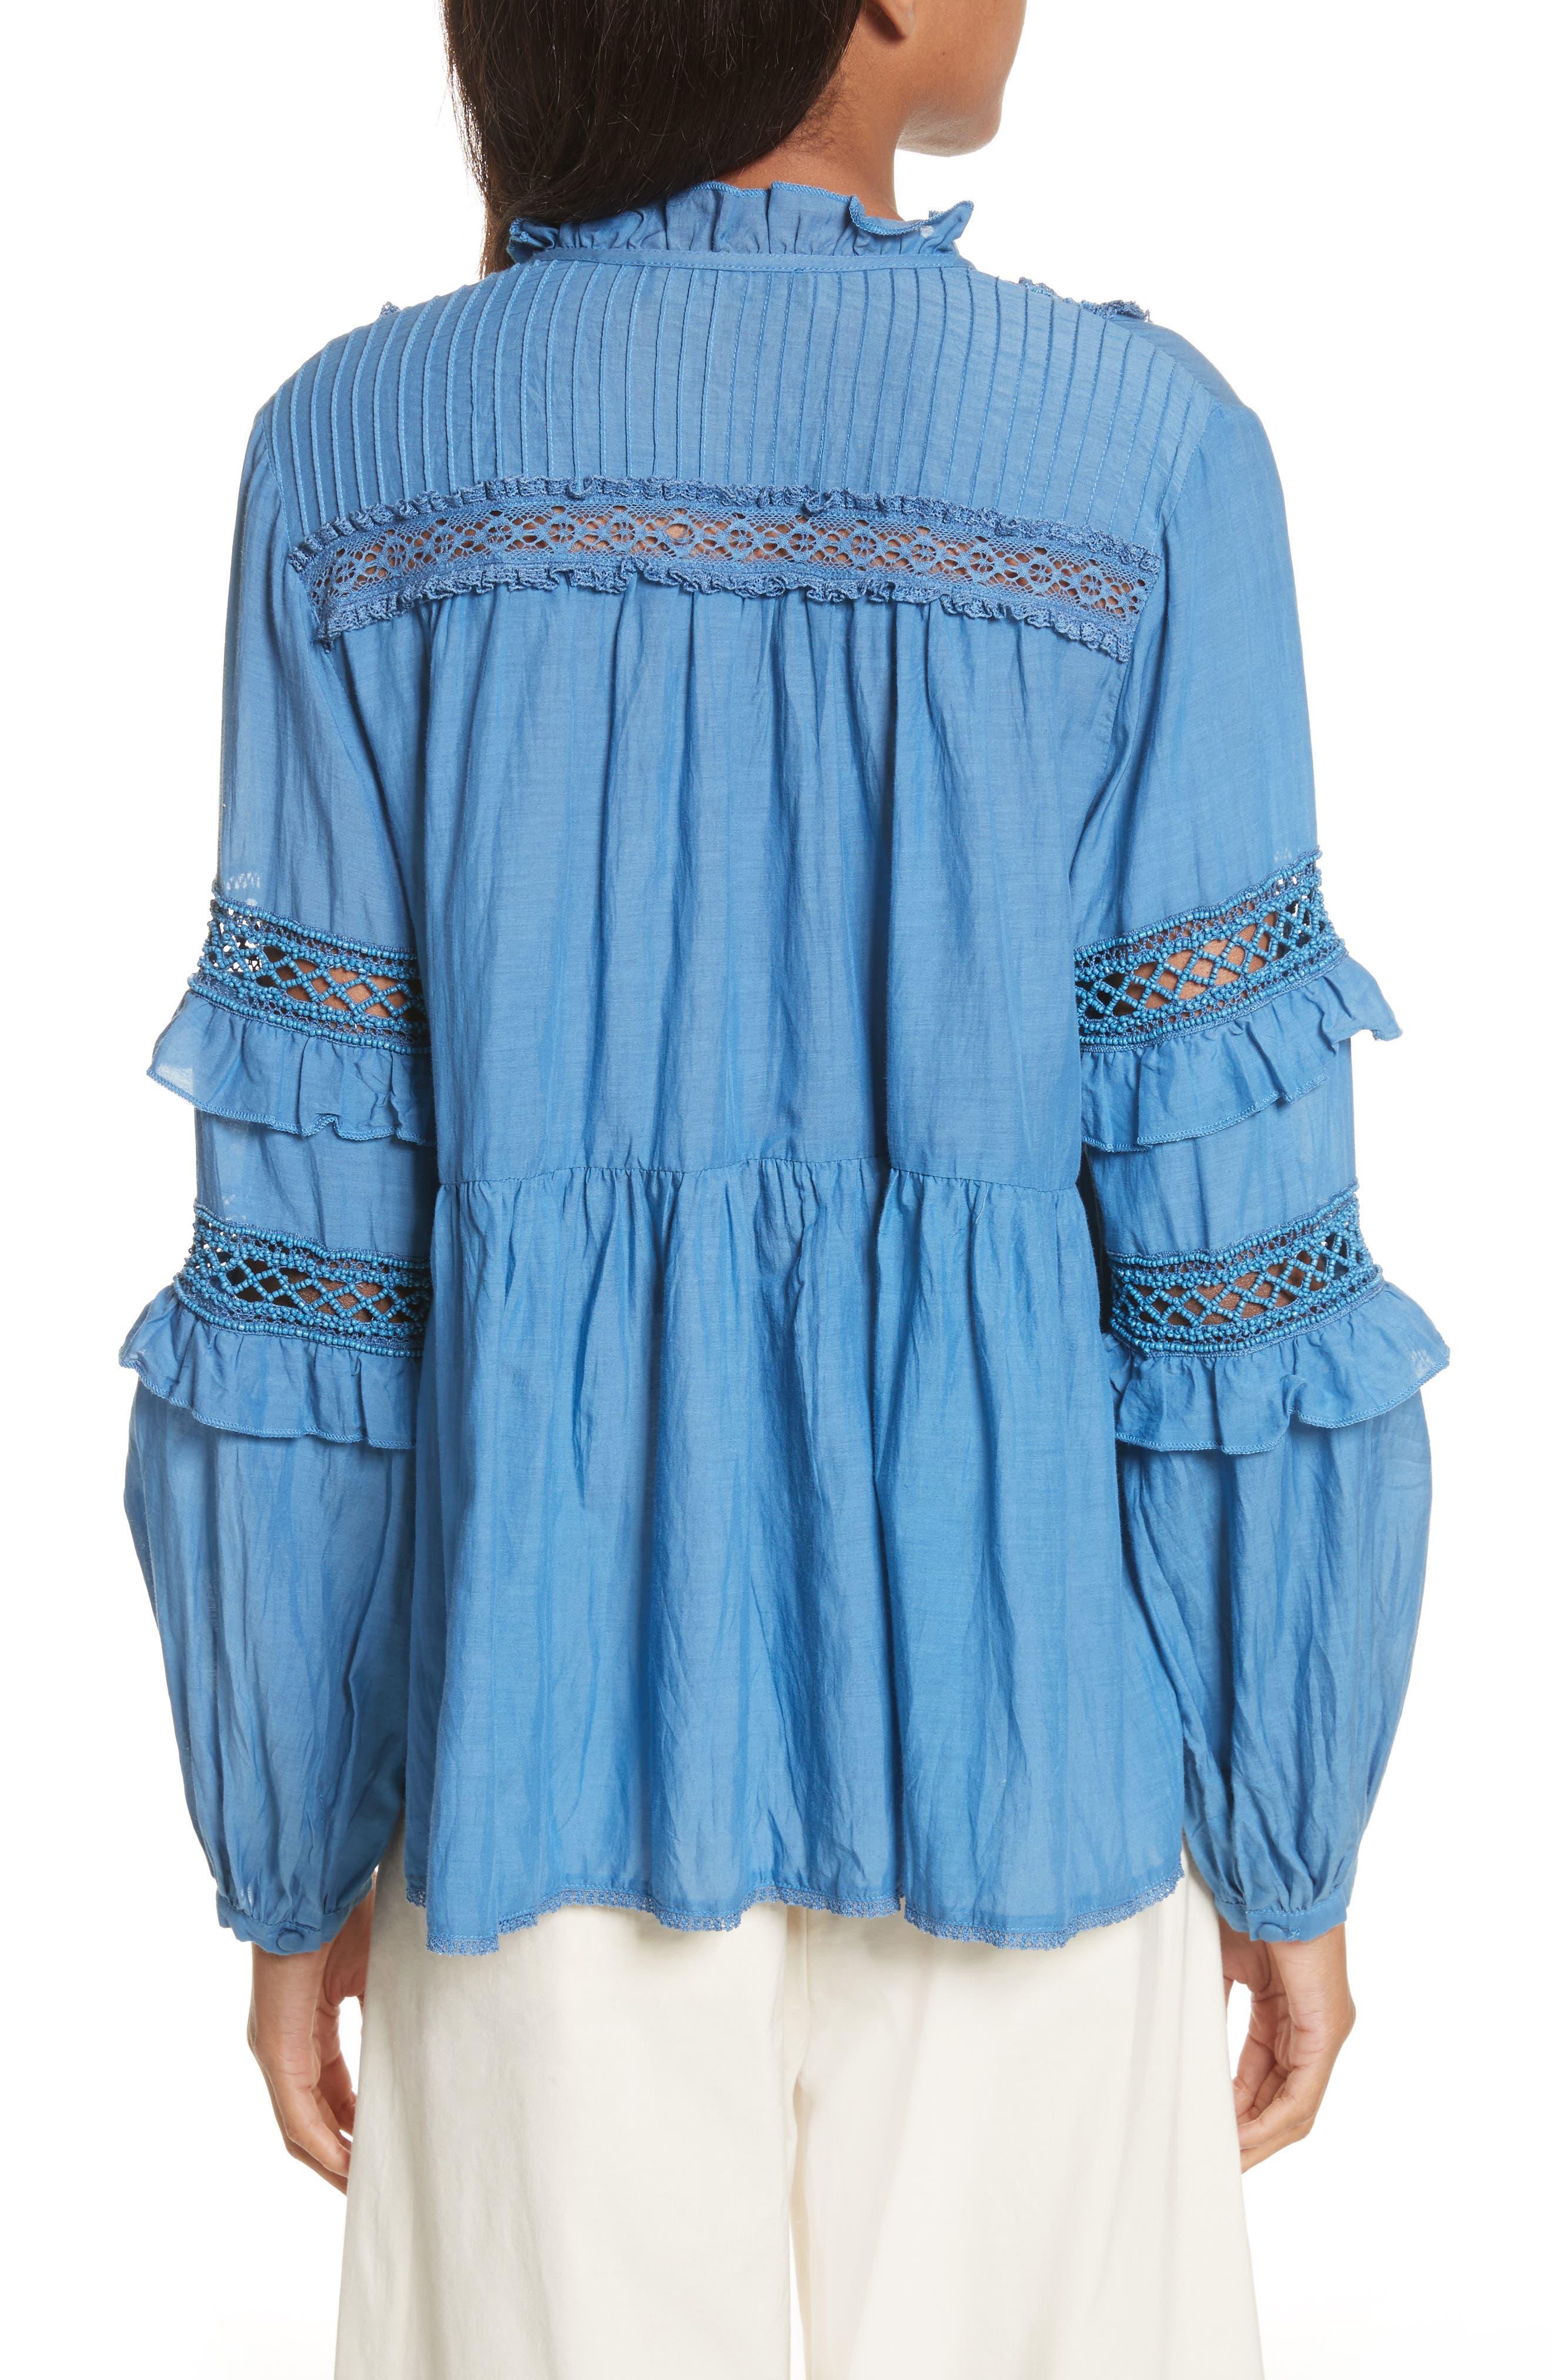 Adaline Ruffle Cotton Blouse,                             Alternate thumbnail 2, color,                             400